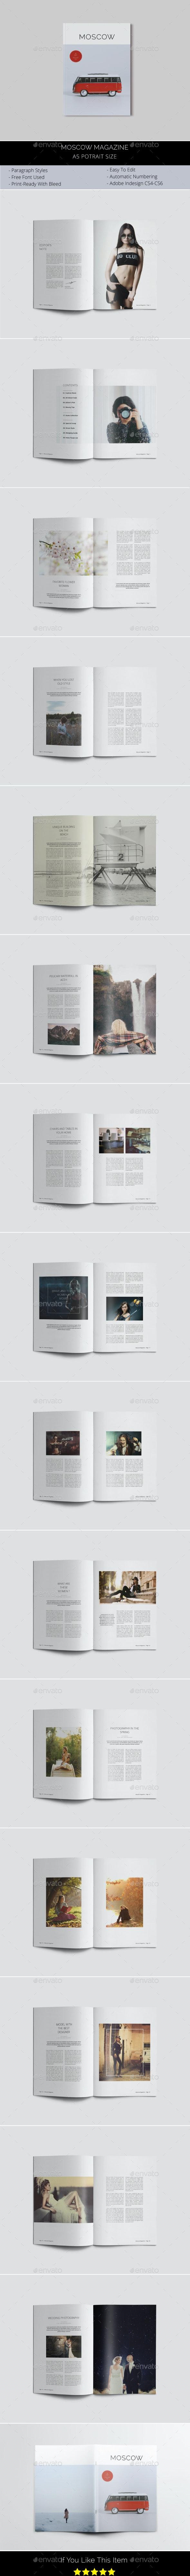 A5 Moscow Magazine - Magazines Print Templates